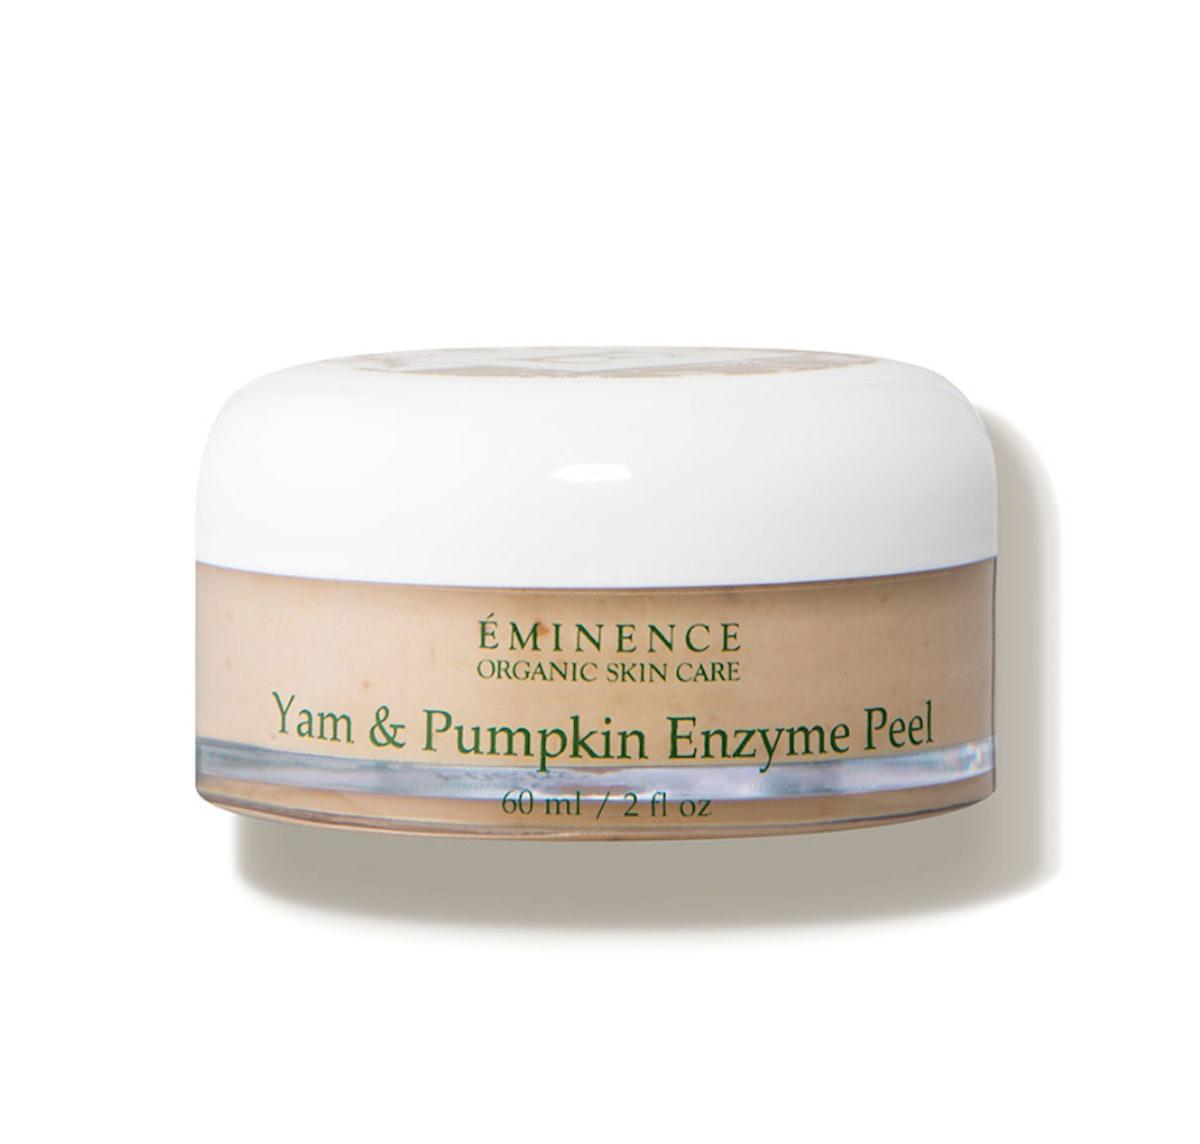 Eminence Organic Skin Care Yam and Pumpkin Enzyme Peel